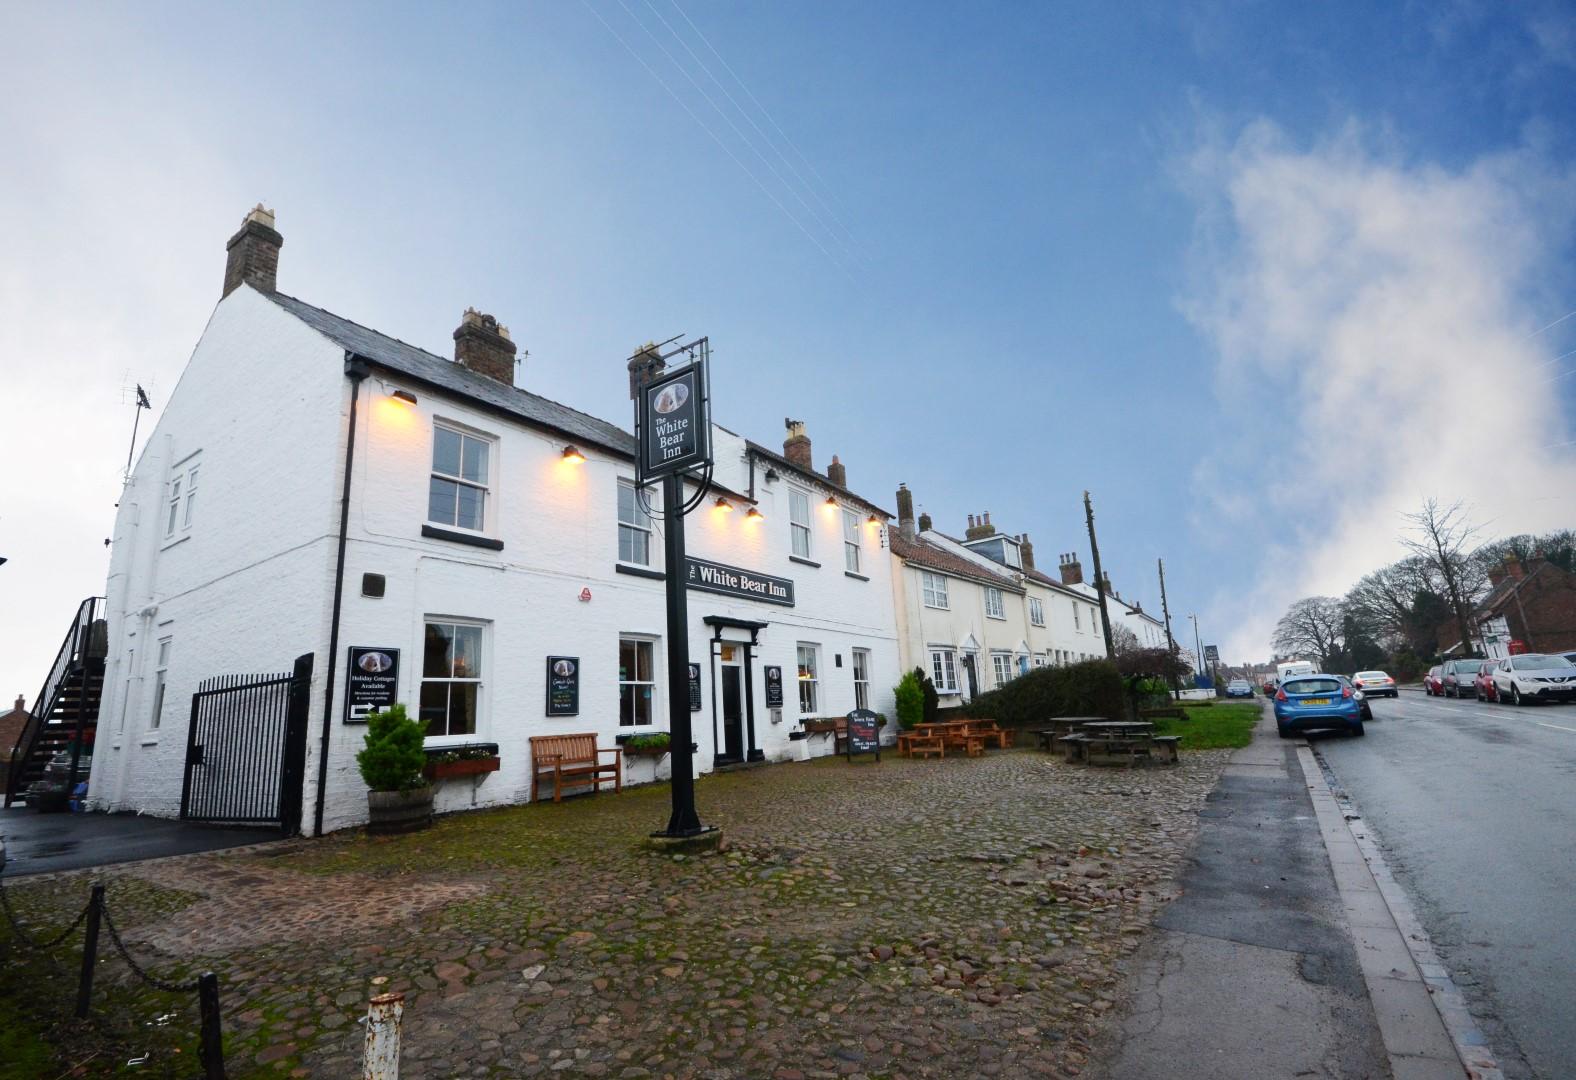 The White Bear Inn, Stillington, York, North Yorkshire